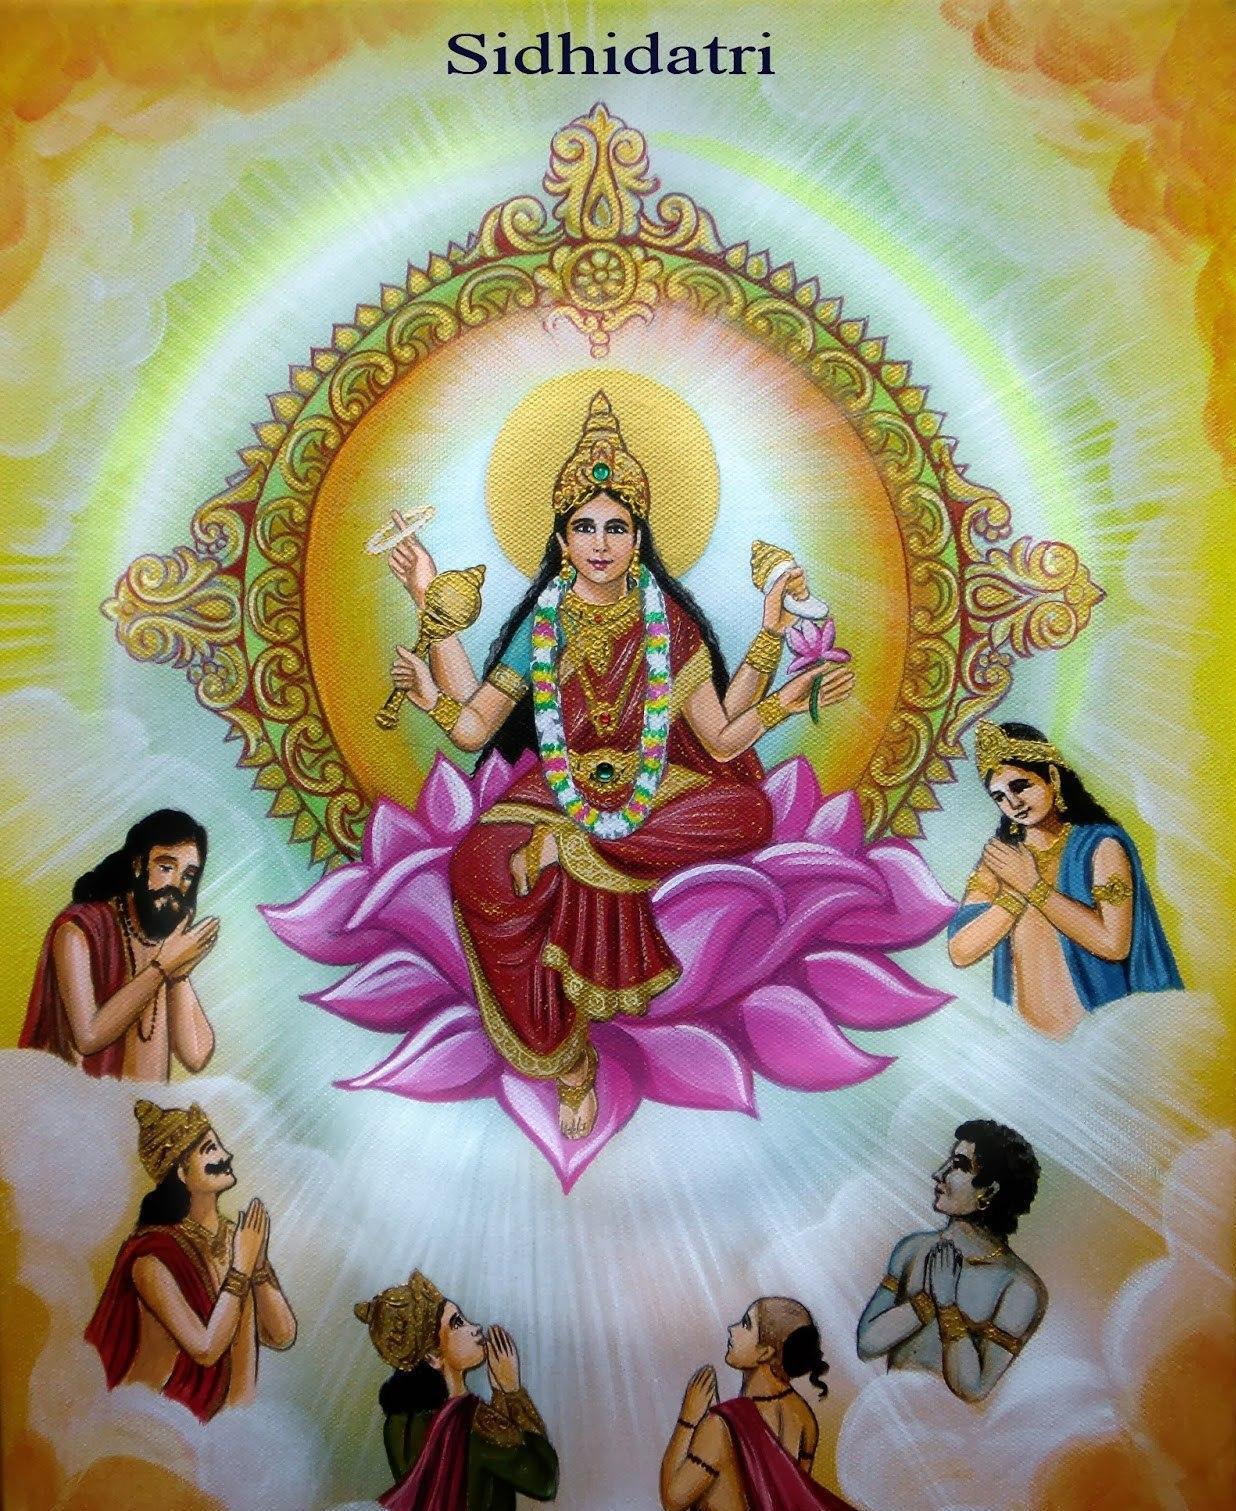 Hindu goddess siddhidatri one of the form of lord durga devi